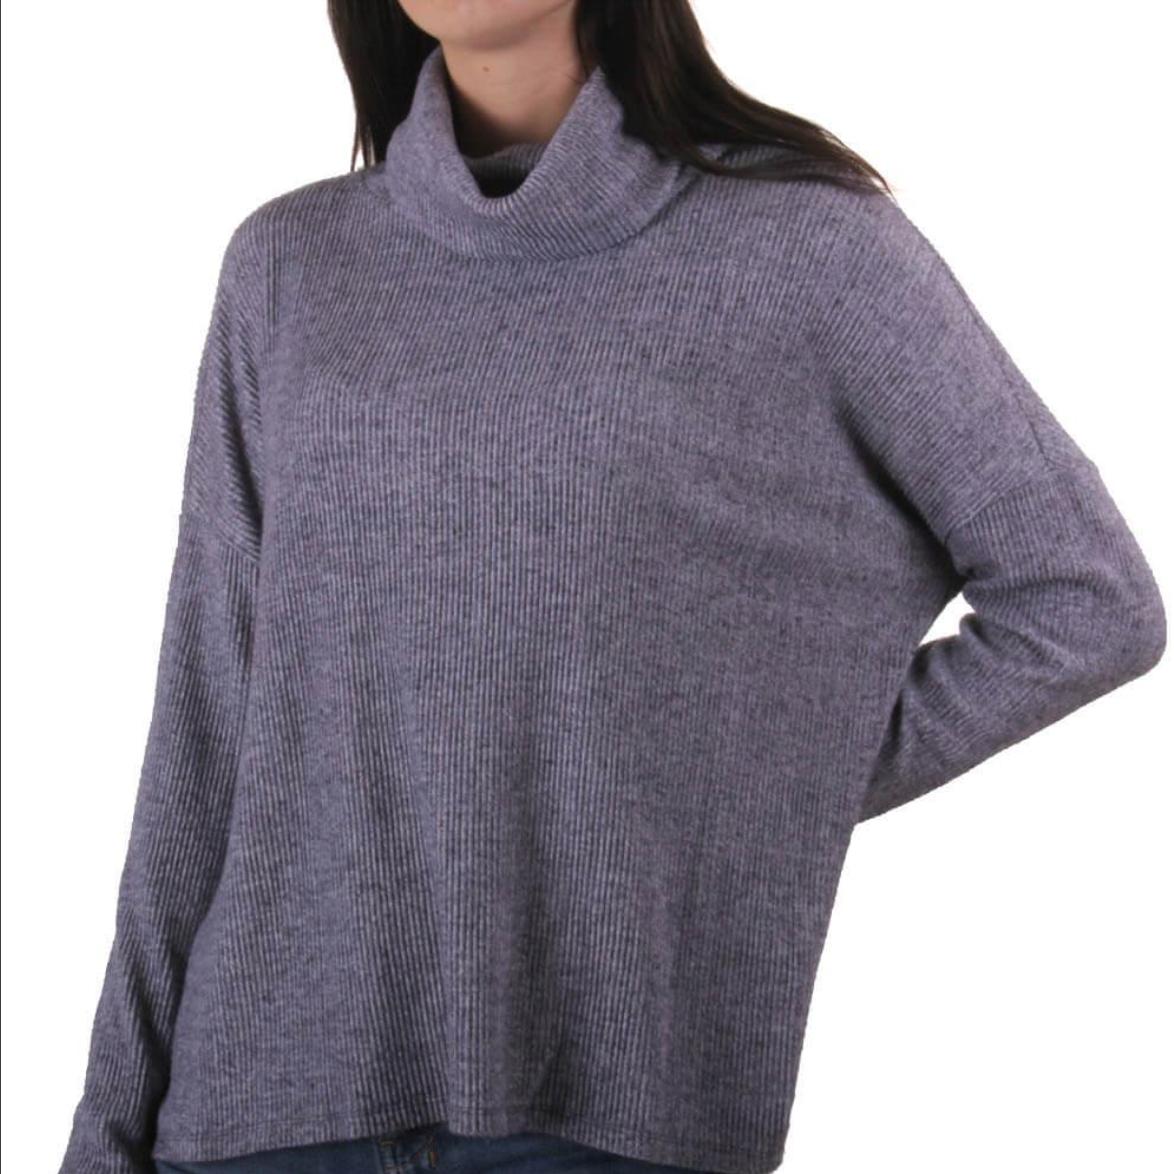 Grey Flecked Cowl Neck Top